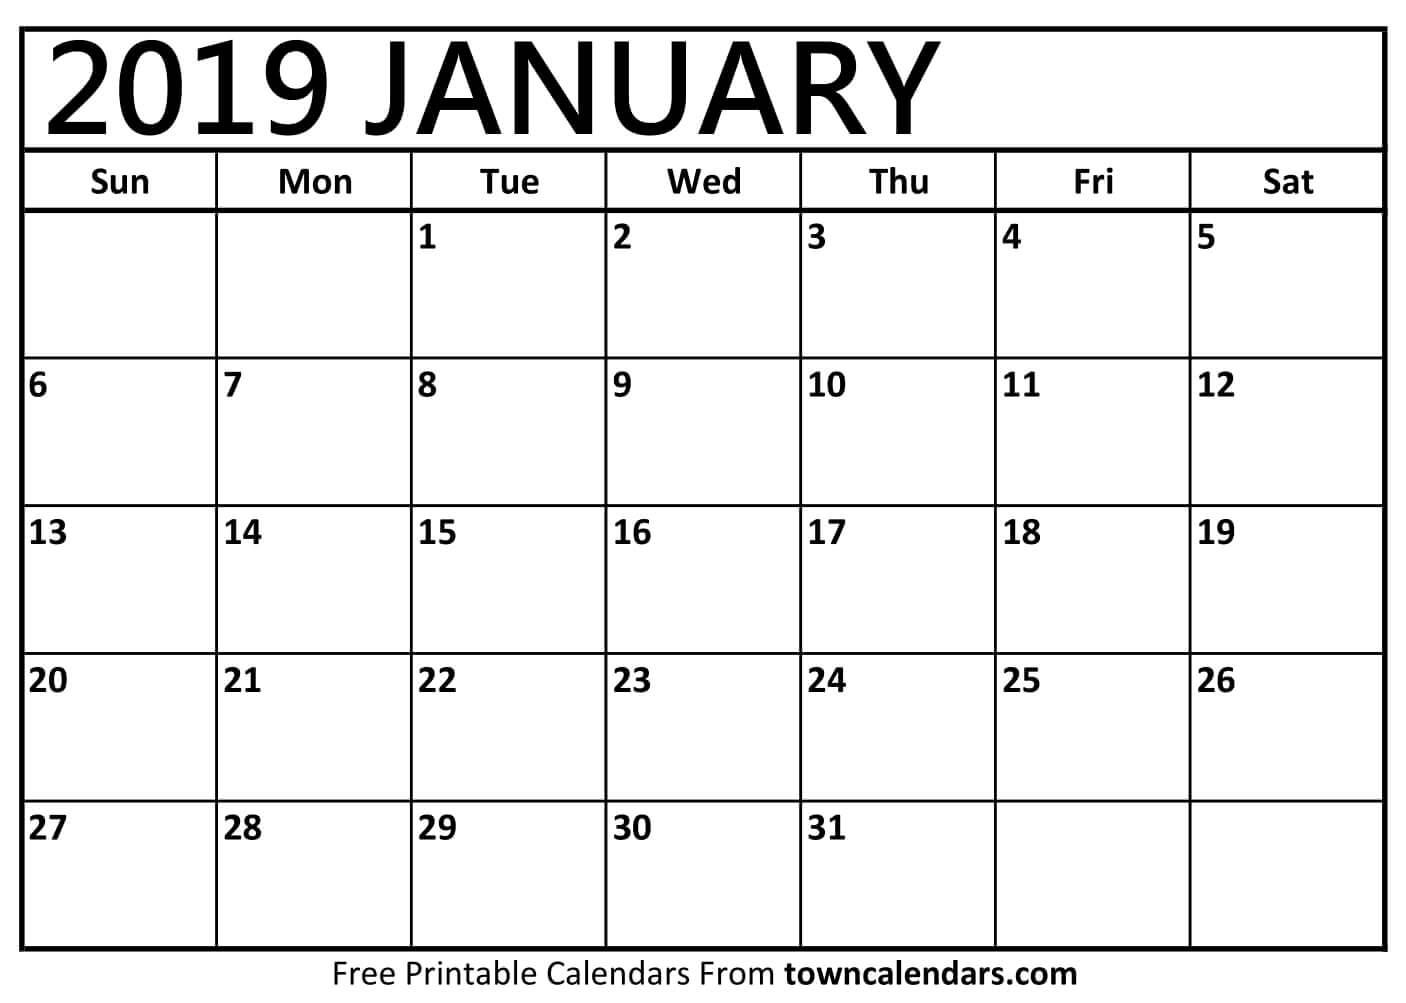 Printable January 2019 Calendar - Towncalendars